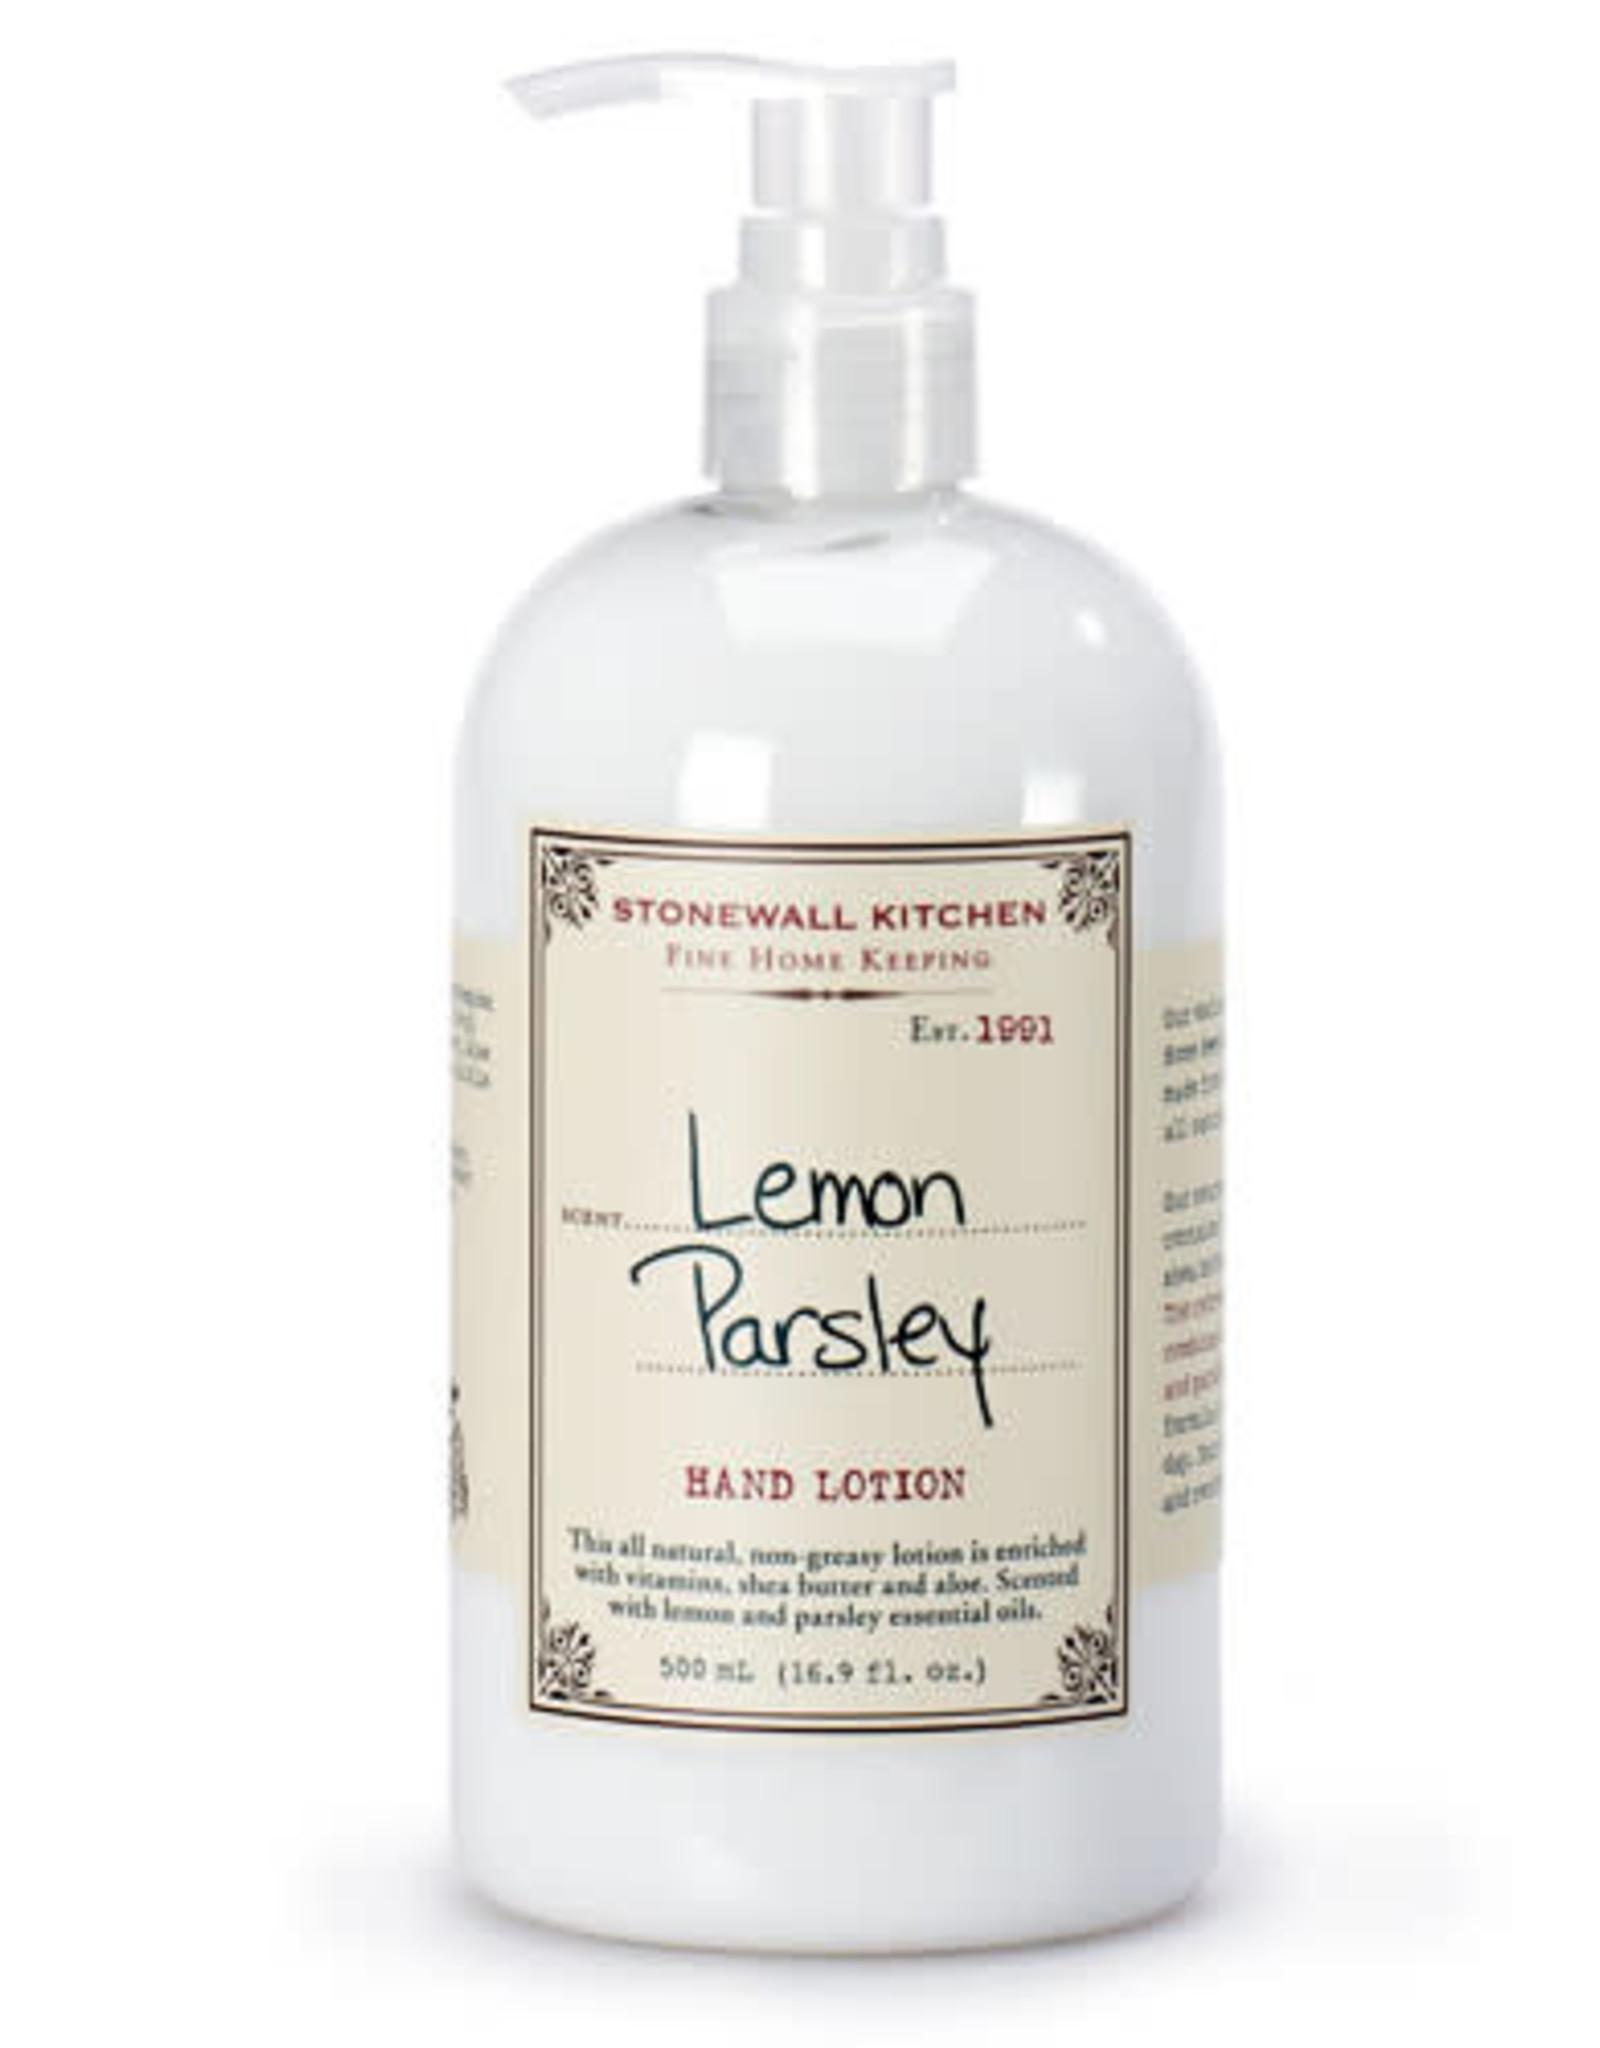 Stonewall Kitchen Lemon Parsley Hand Lotion